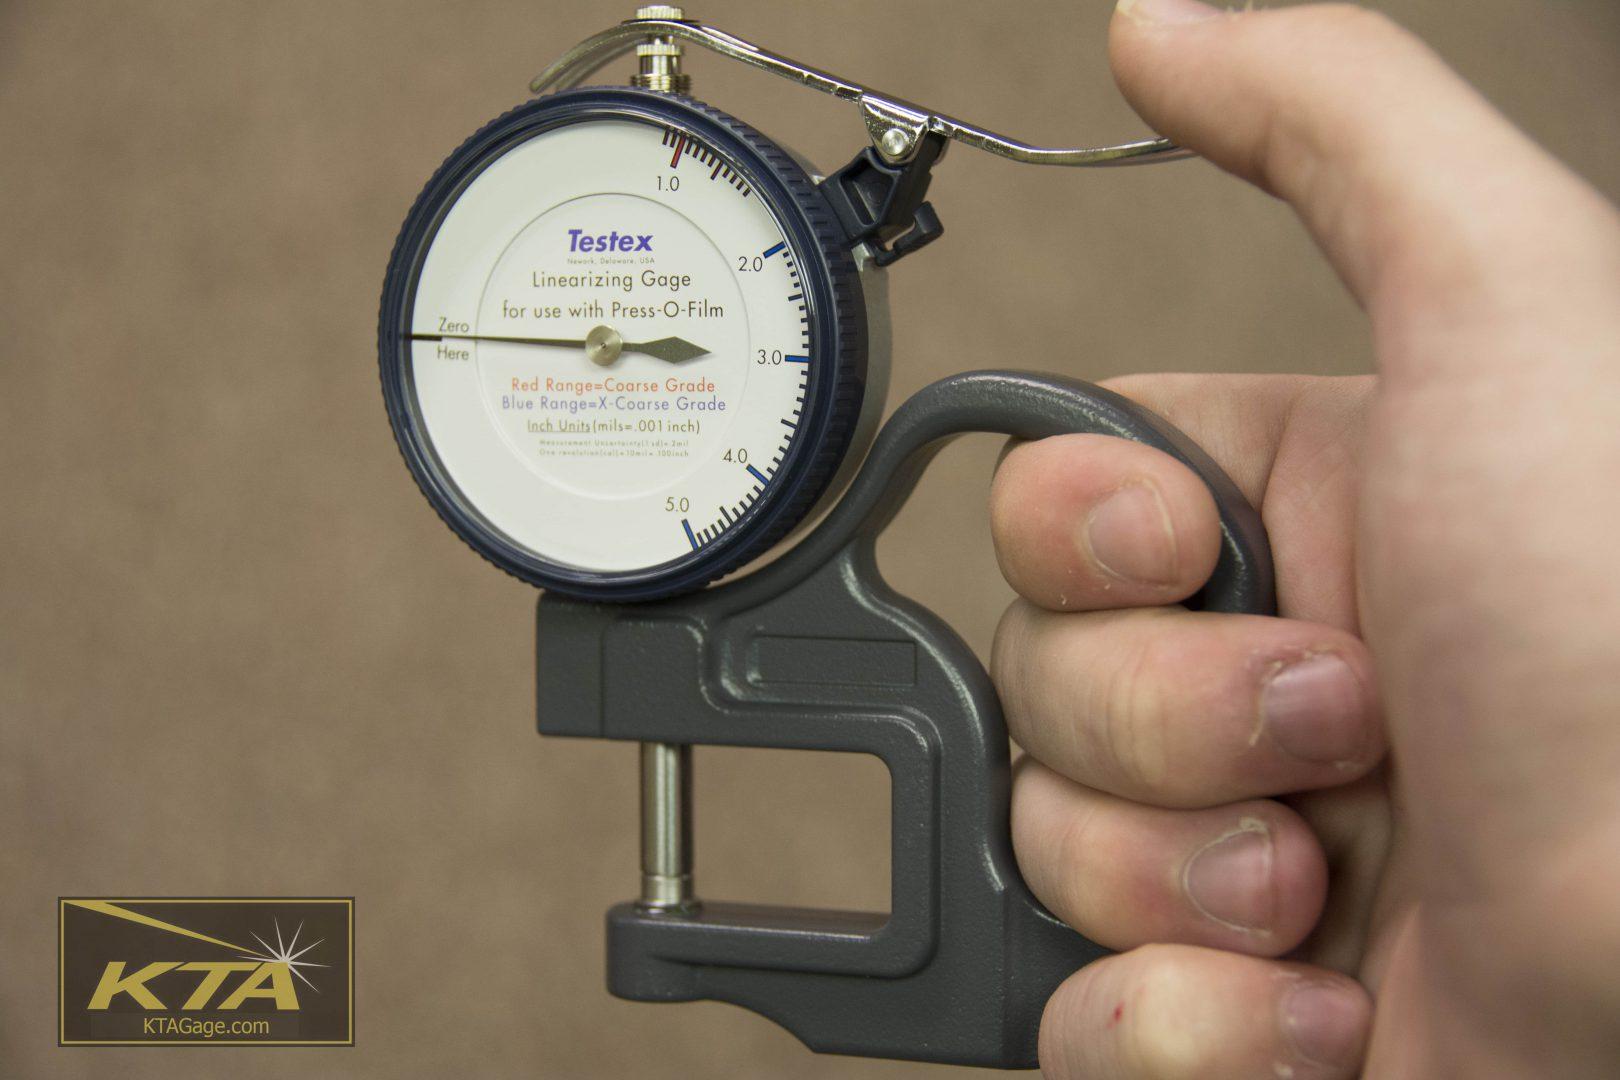 Testex Linearizing Micrometer